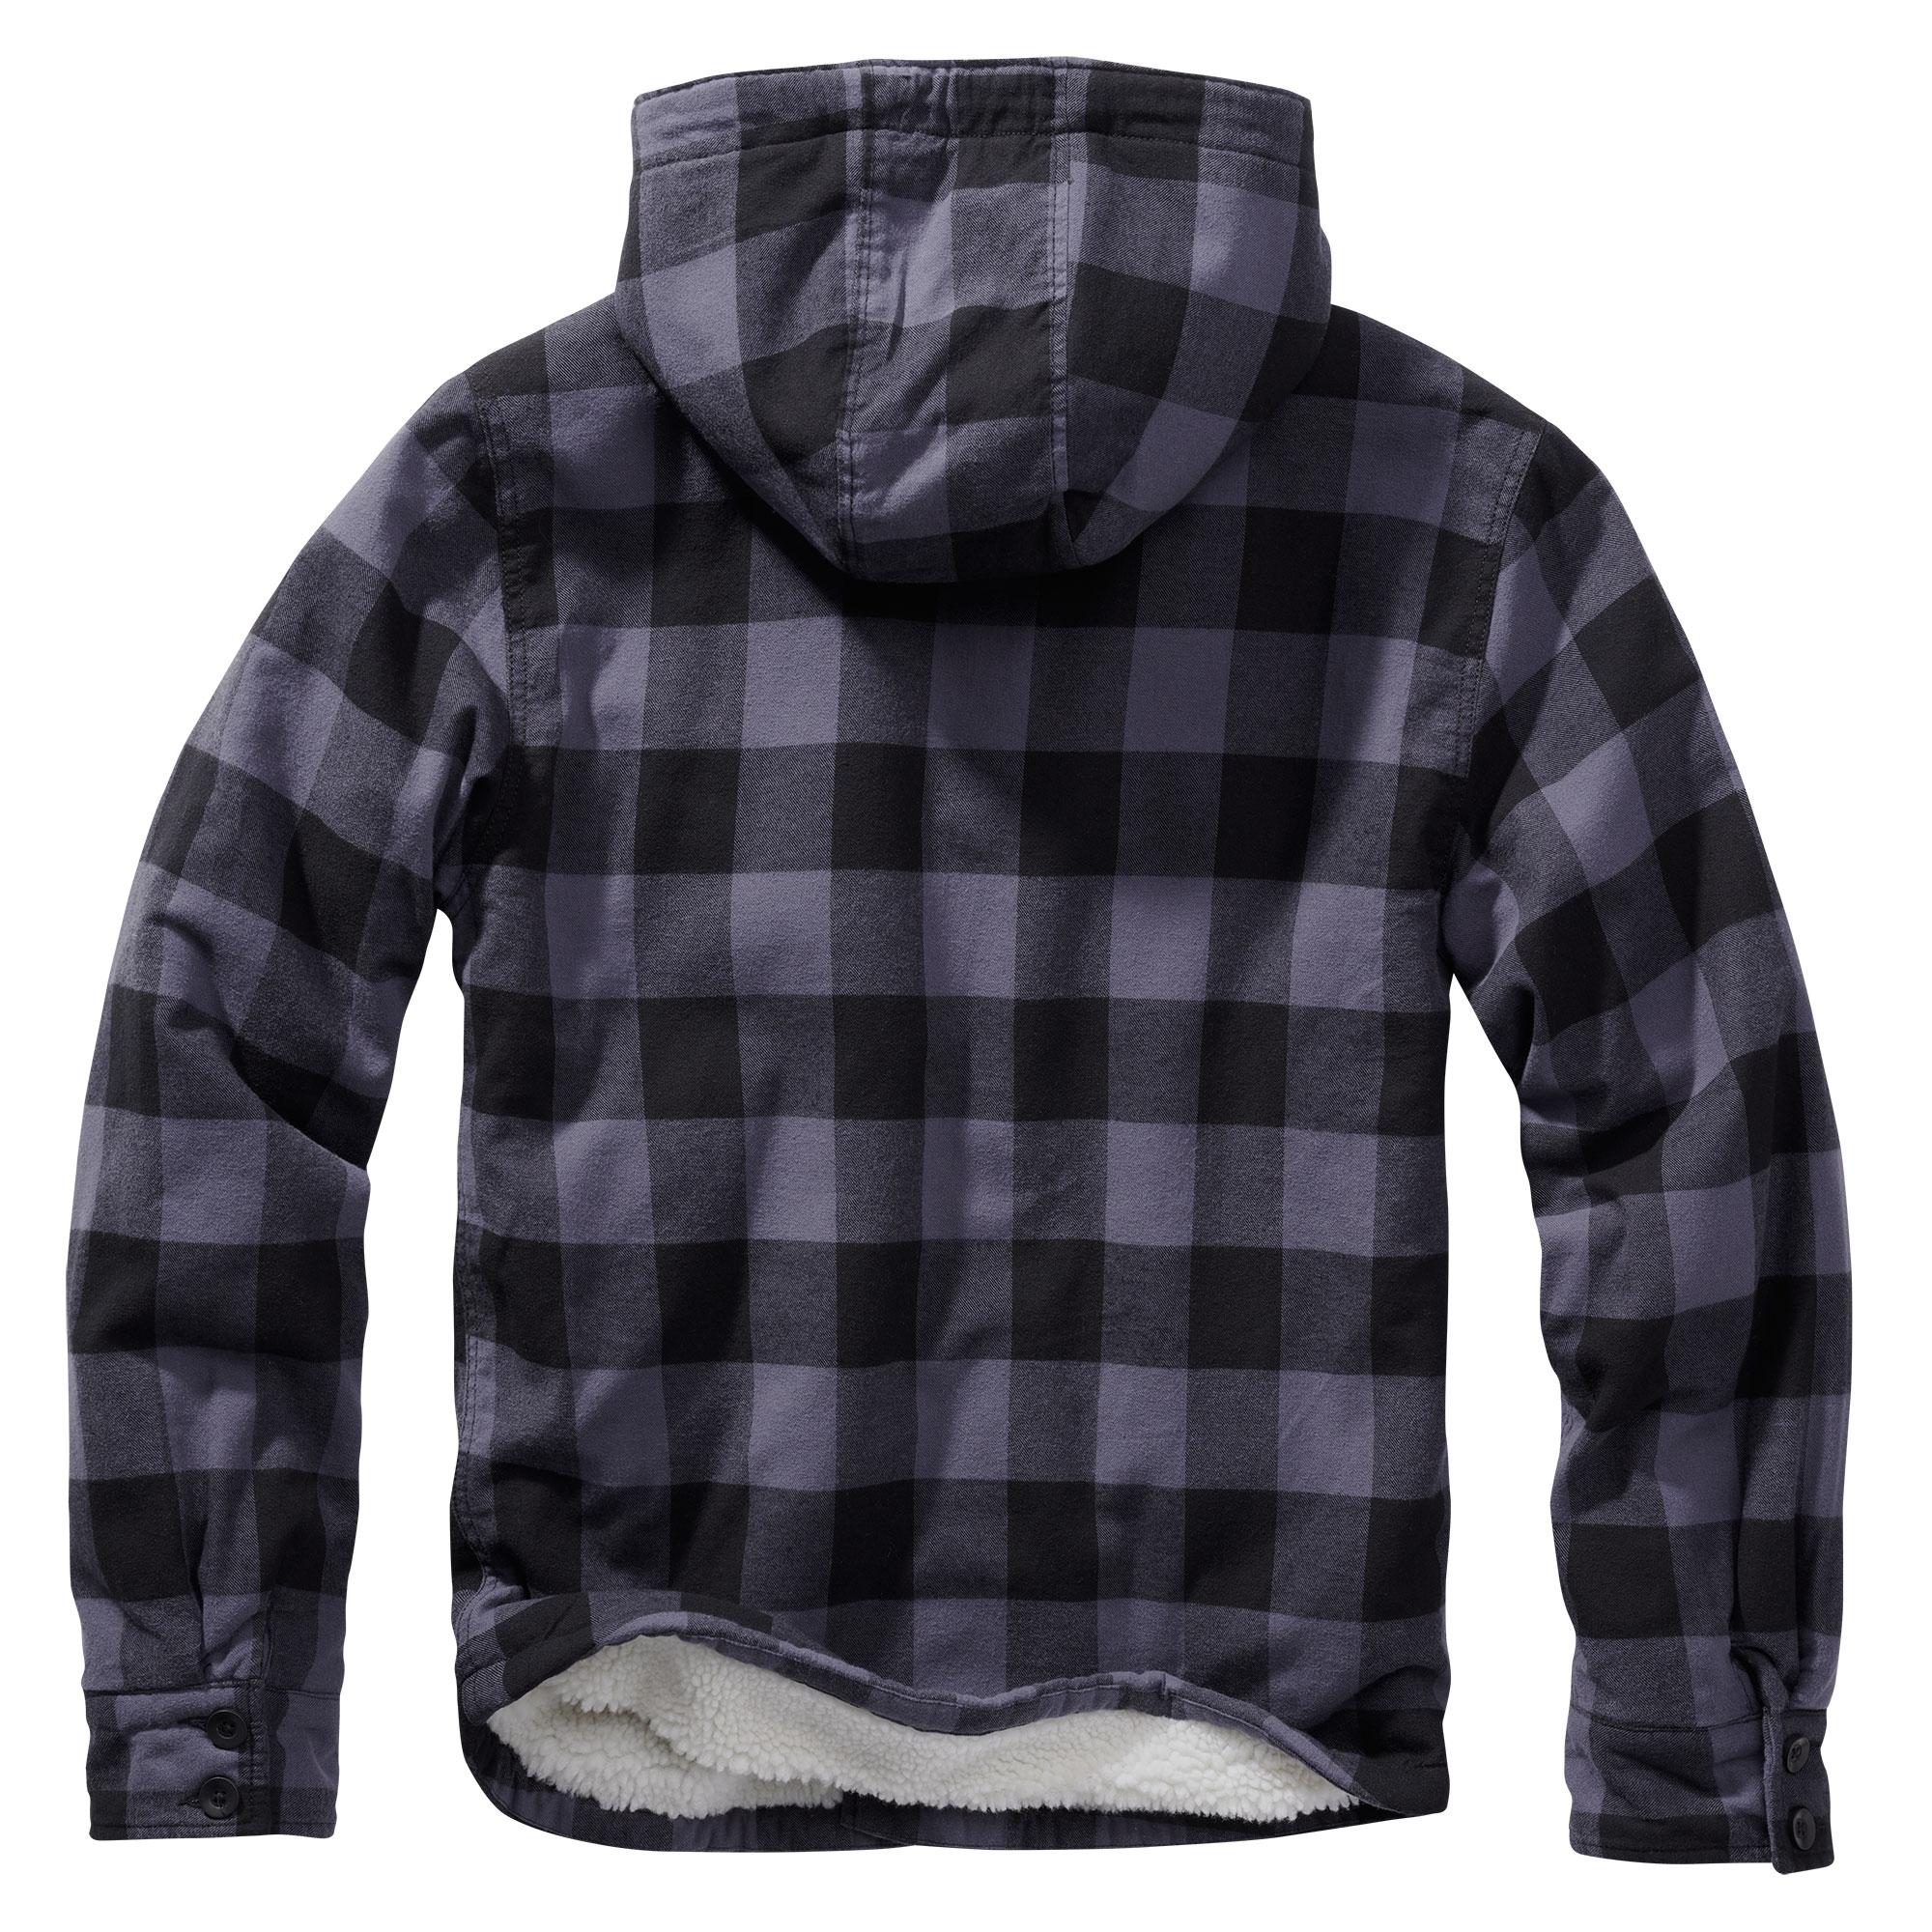 Brandit-Lumberjack-Kapuzen-Jacke-gefuettert-Holzfaellerhemd-Winterjacke-S-5XL Indexbild 4